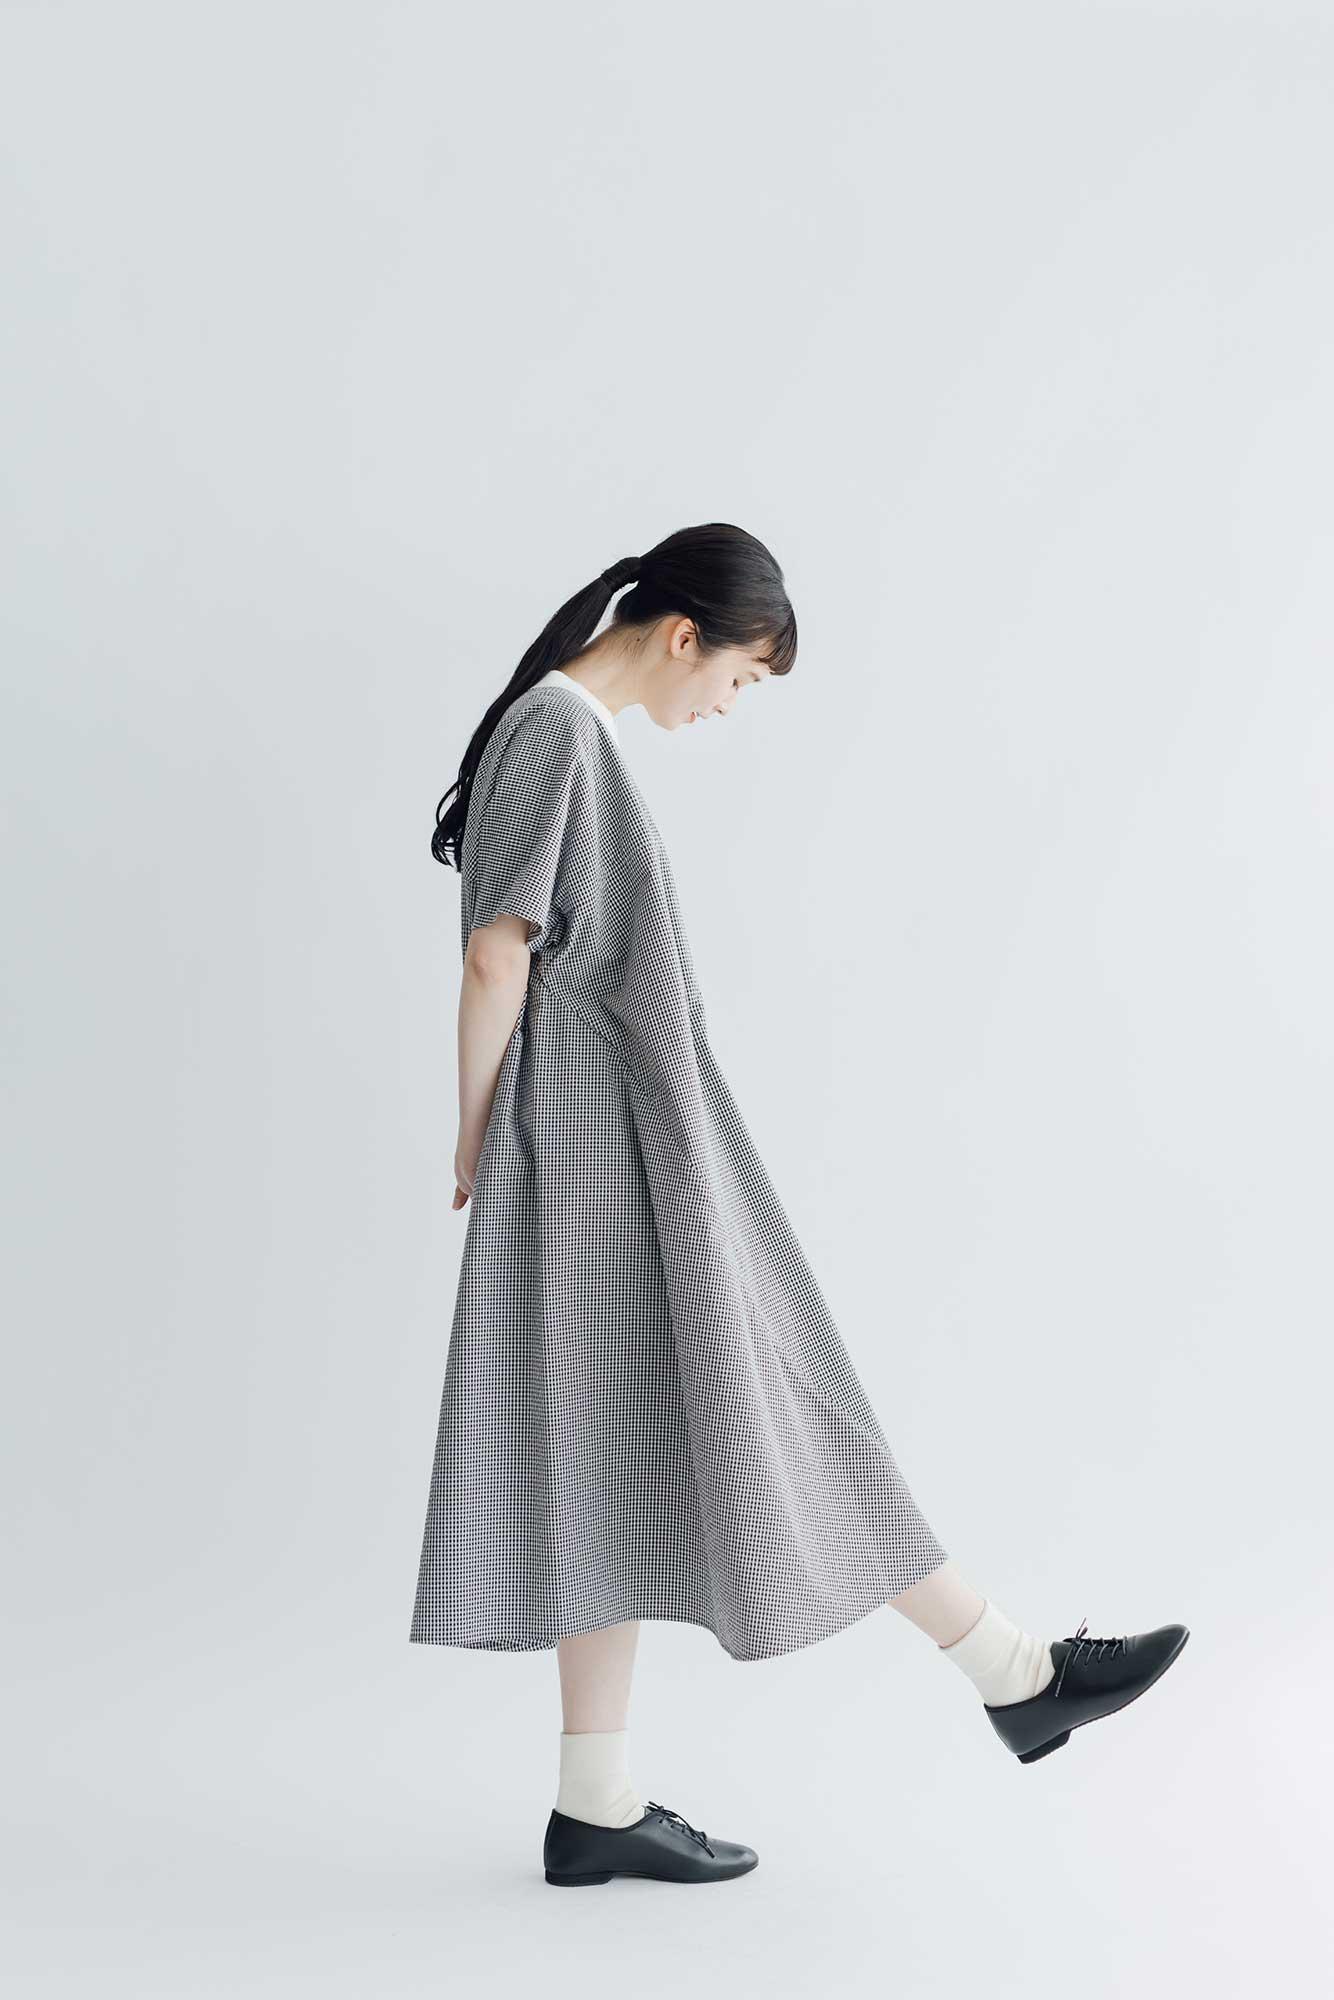 Atelier d'antan Taafee コットン ワンピース ホワイト×ブラックチェック